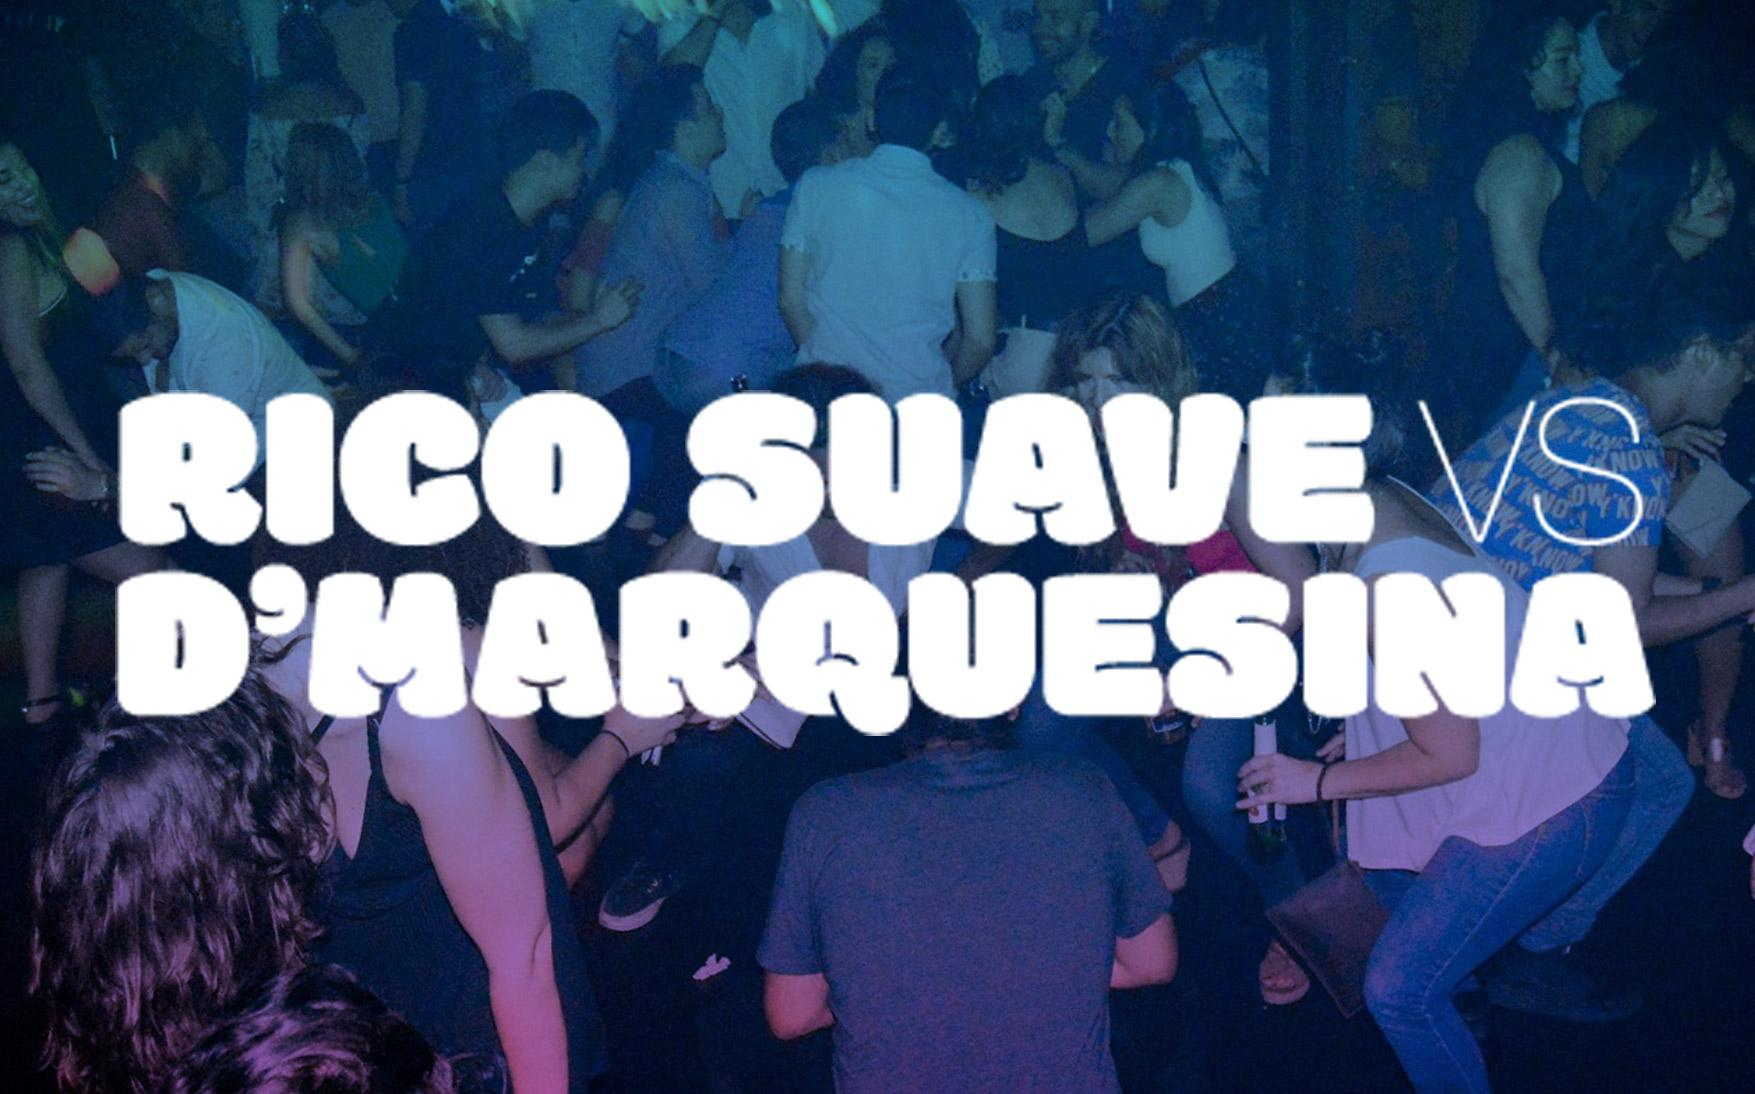 Rico Suave vs D'marquesina, NYC's favorite fiesta latina!